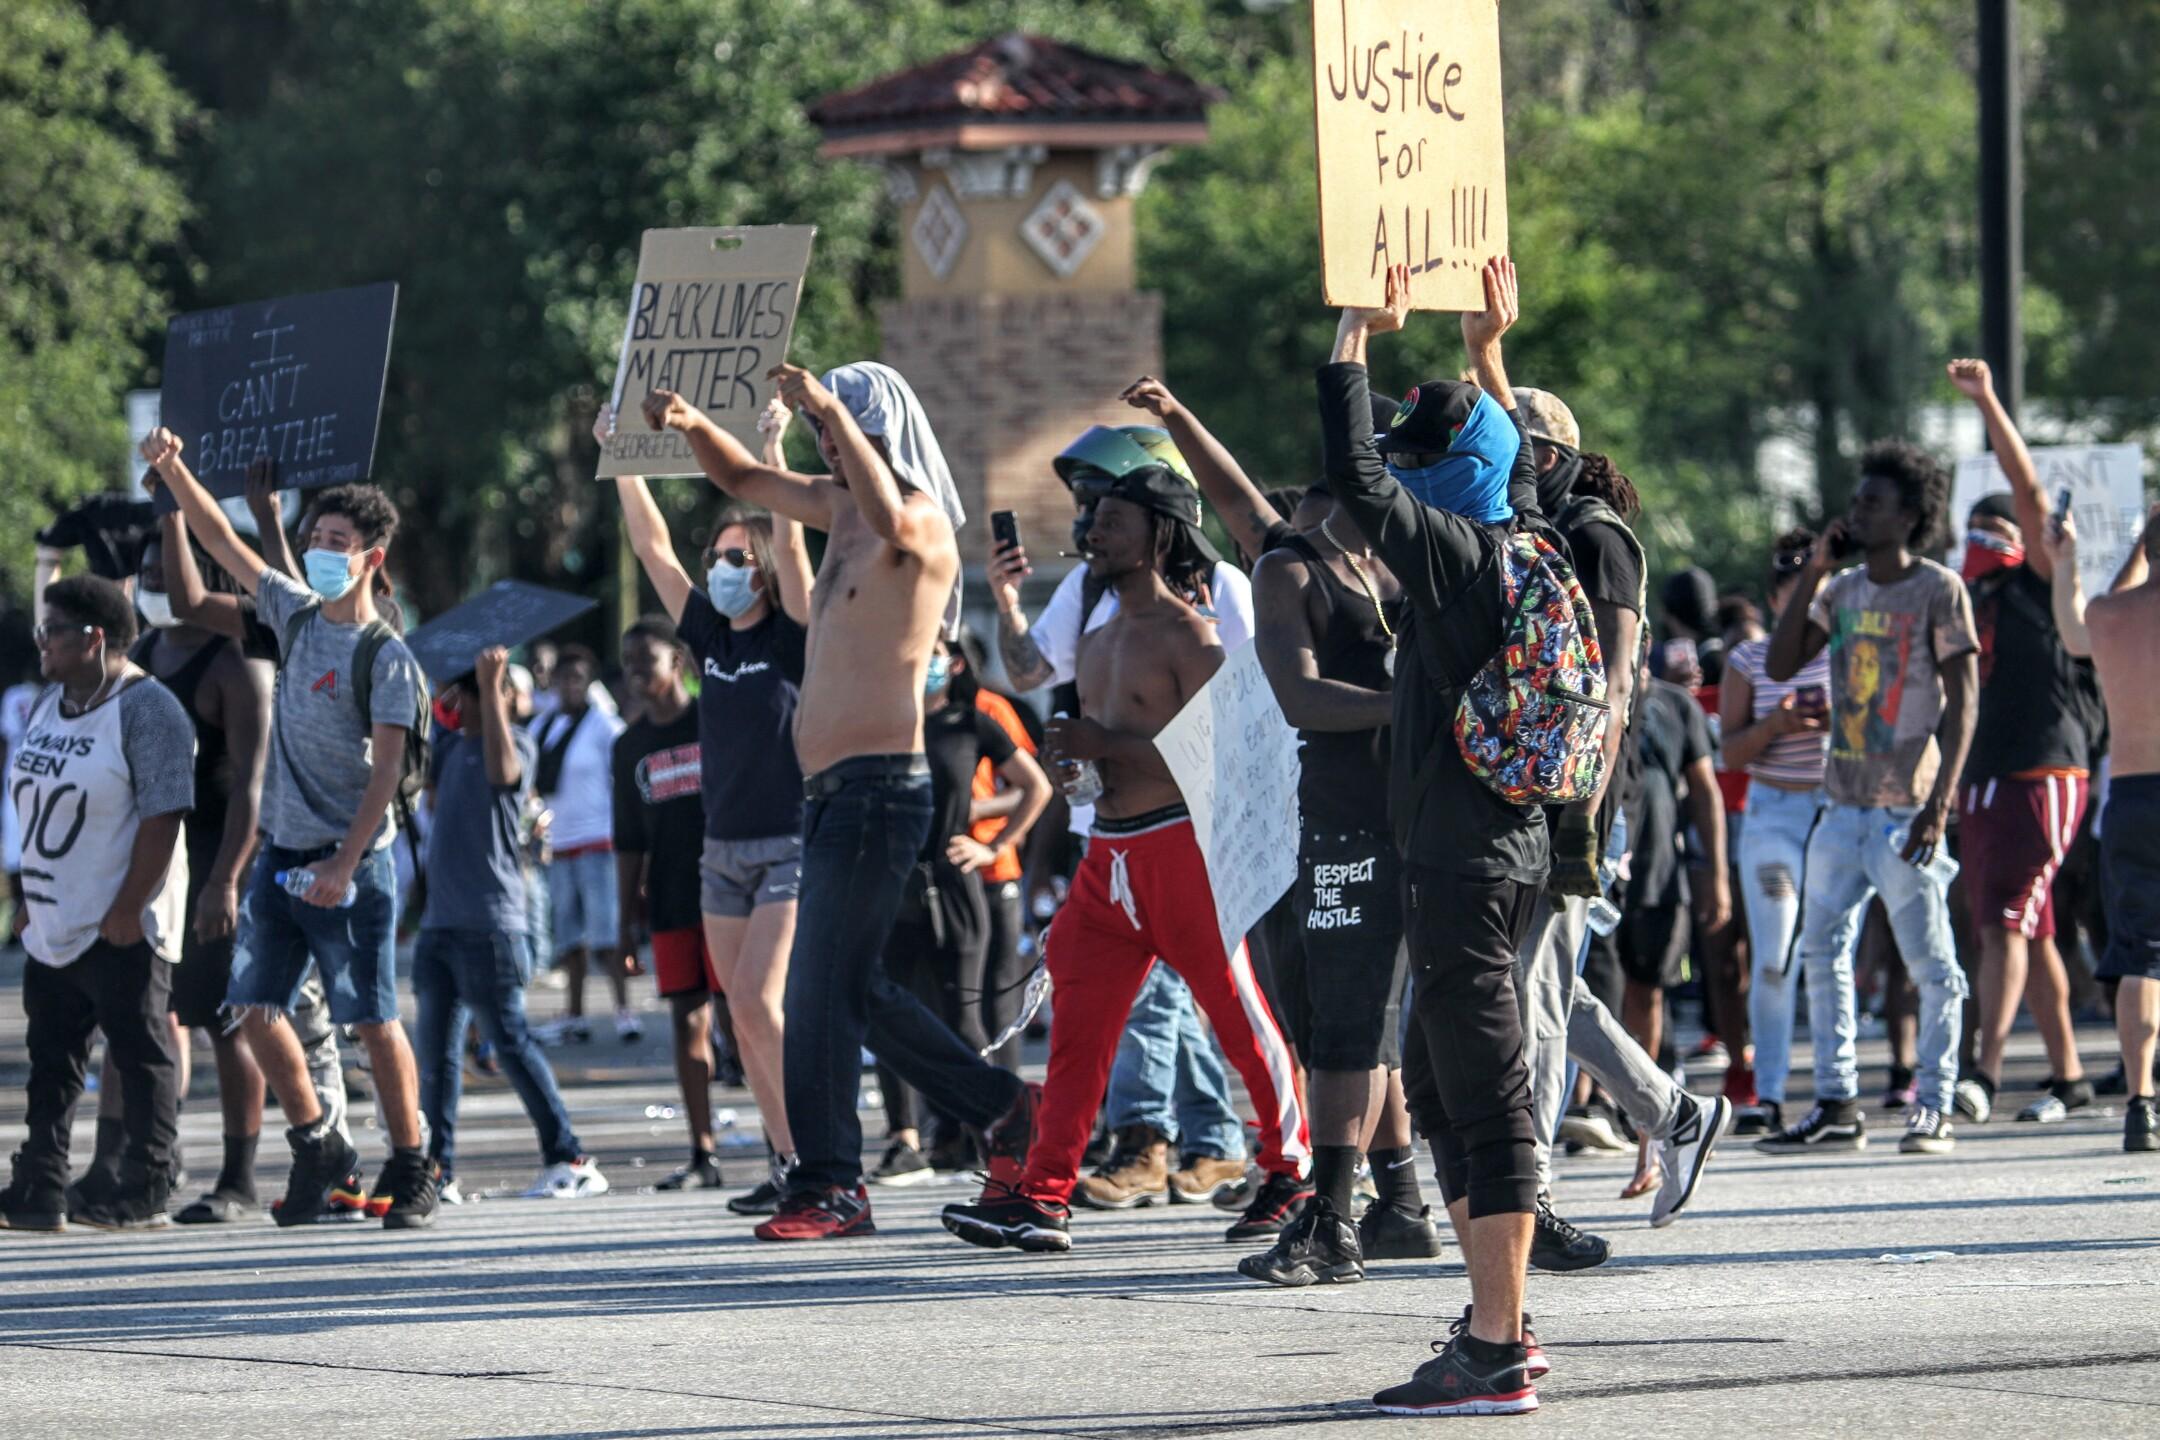 lakeland_protest_IMG_9099 (49).jpg